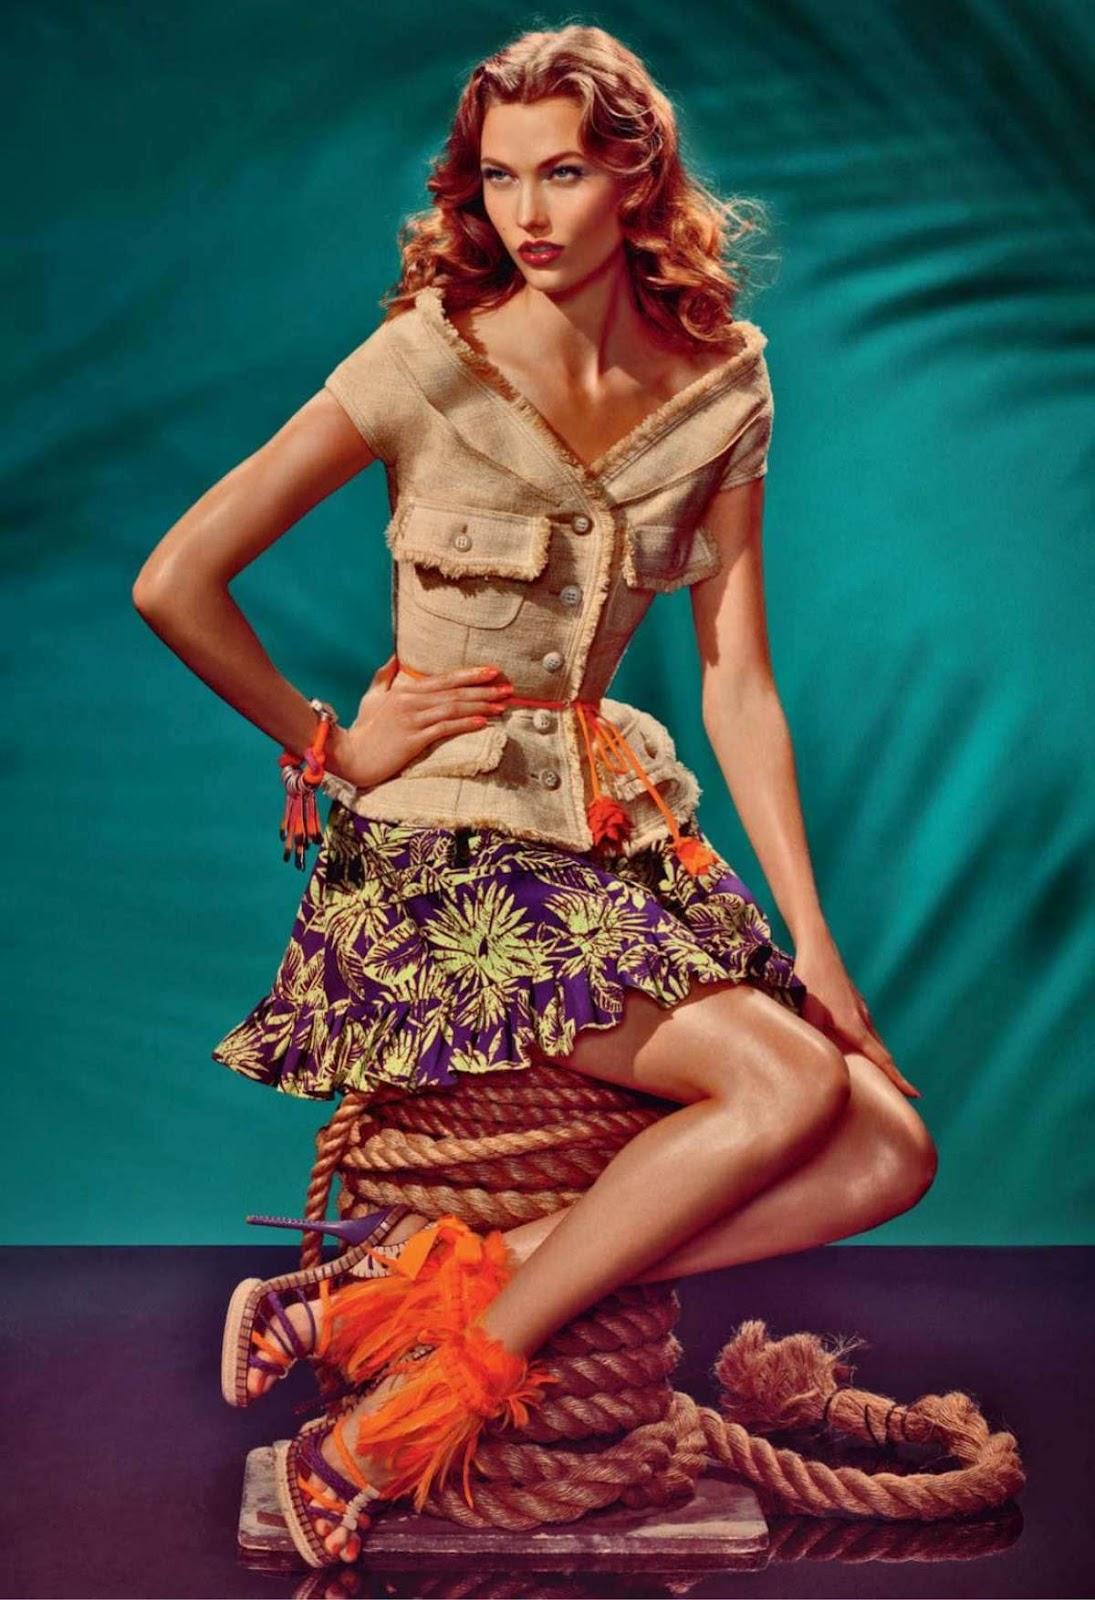 http://1.bp.blogspot.com/-BMRW1N3PGXw/UDurz3_-s7I/AAAAAAAAFIg/9i21G68dvnA/s1600/Christian+Dior+Spring-Summer+2011+marketing+campaign+image+-+model+Karlie+Kloss.jpg